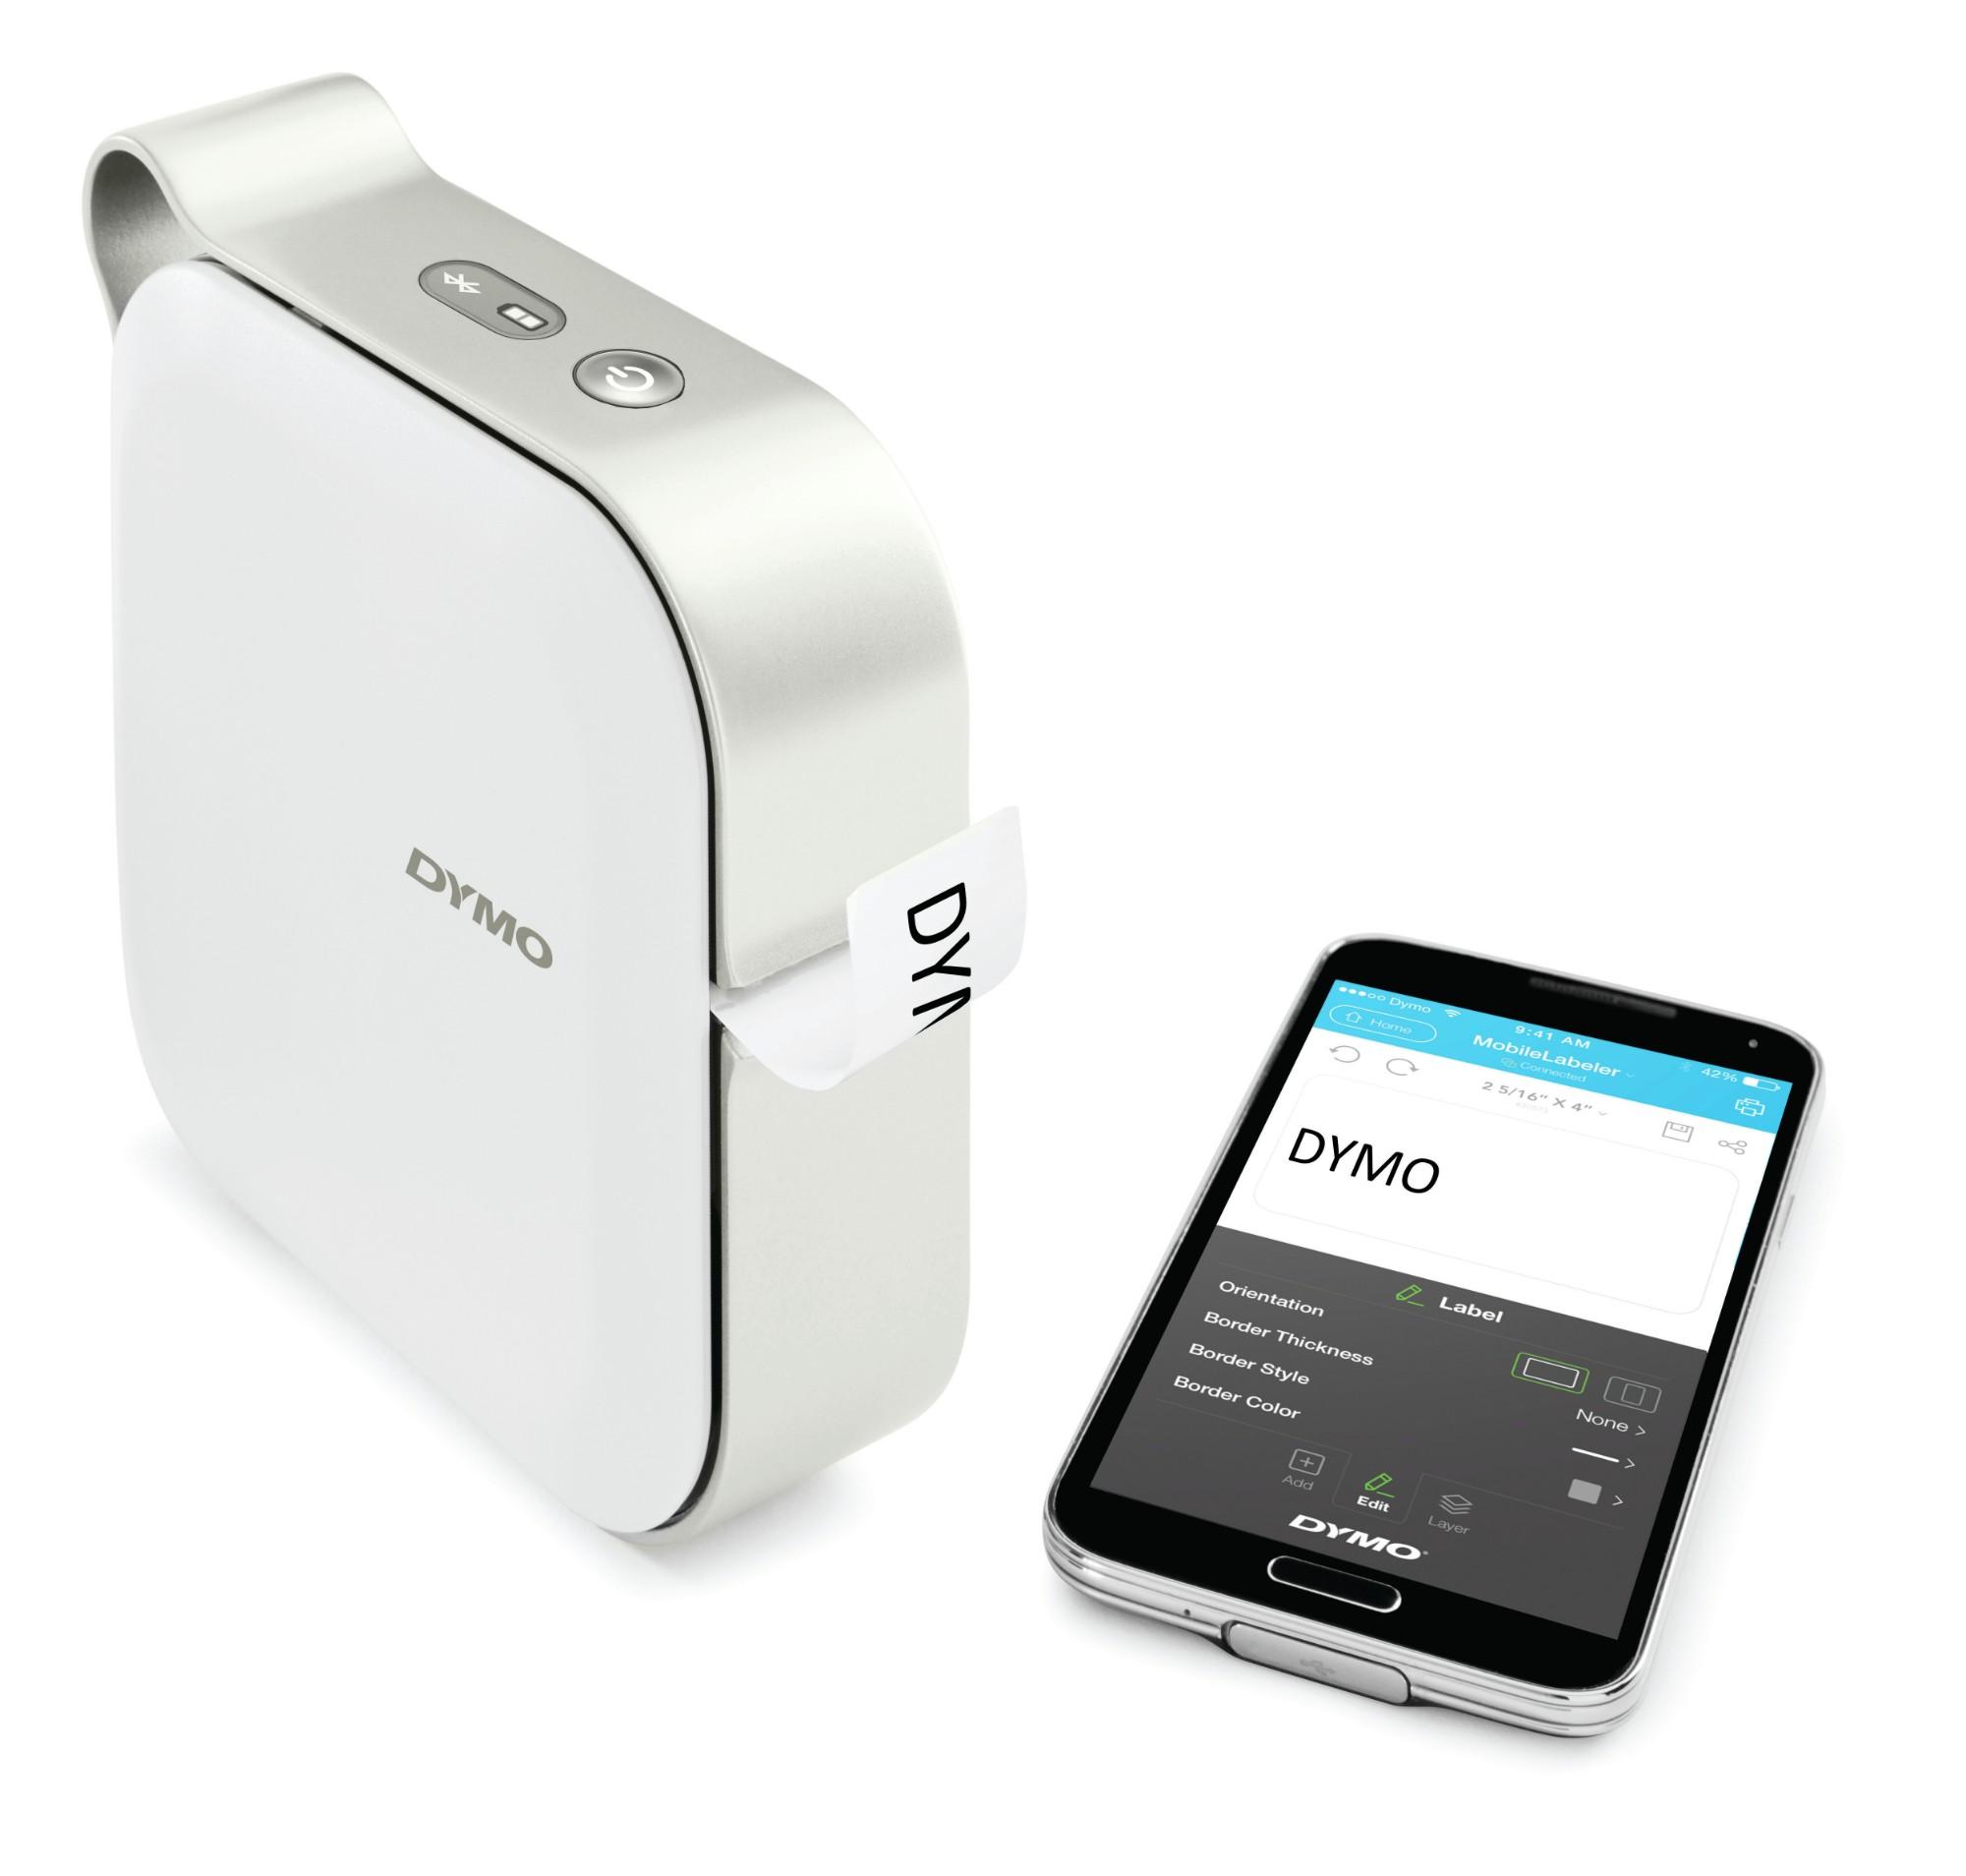 DYMO MobileLabeler - Label printer - thermal transfer - Roll (2.4 cm) - 300 dpi - USB, Bluetooth 2.1